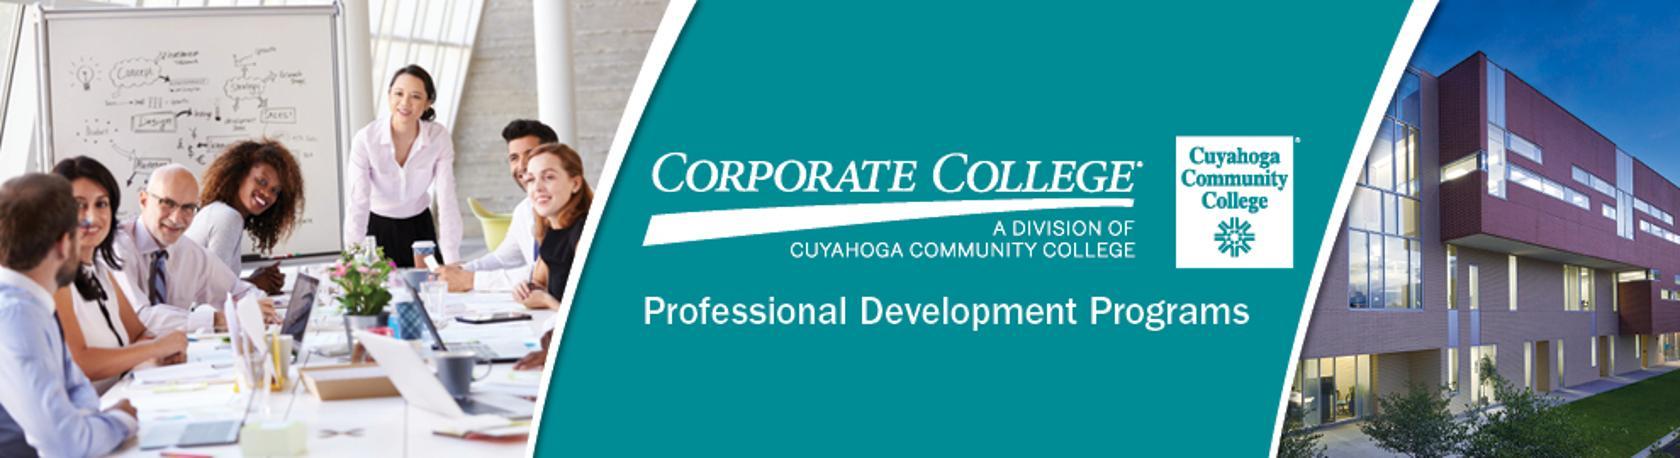 Corporate College Programs At Brunswick University Center